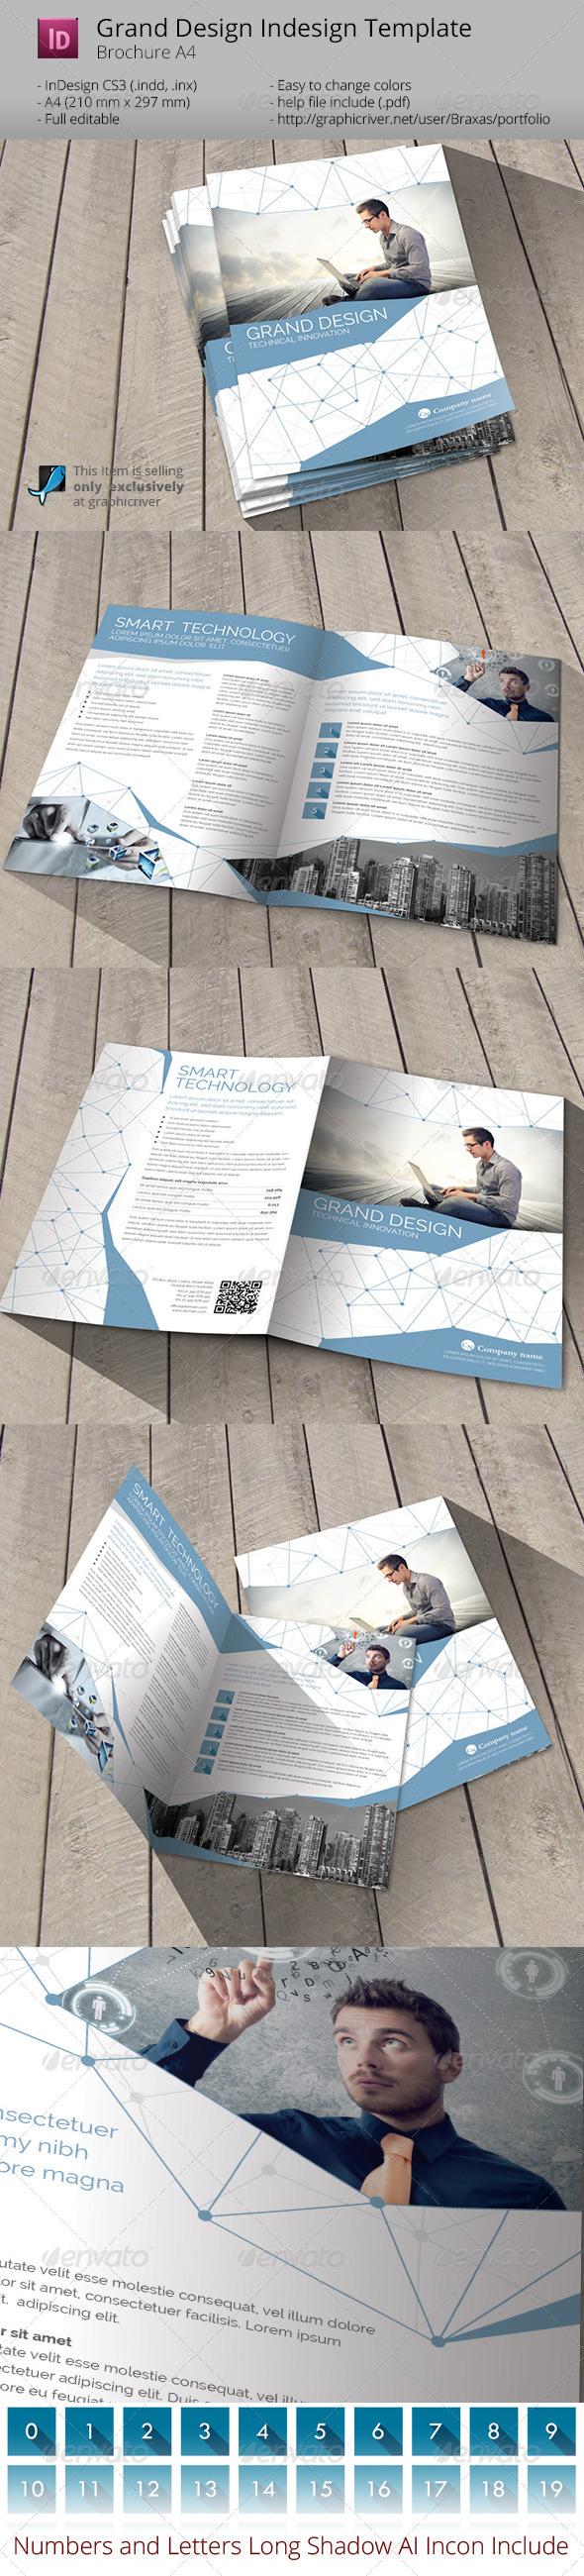 Grand Design - Smart Technology Indesign Template - Informational Brochures